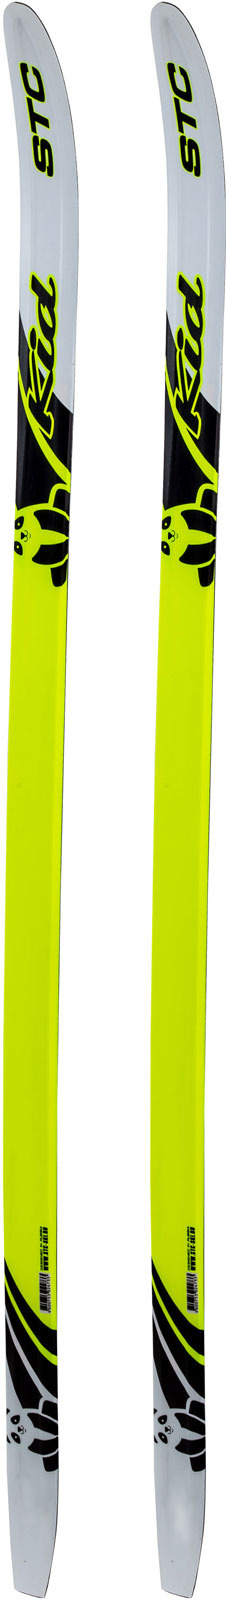 цена на Лыжи прогулочные детские STC Kids skis/ step, 130 см